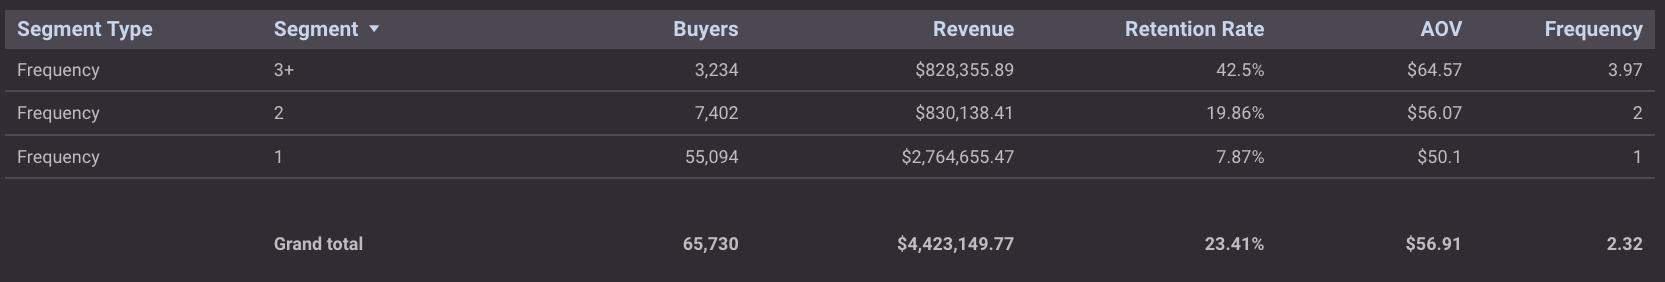 buyer segmentation by frequency